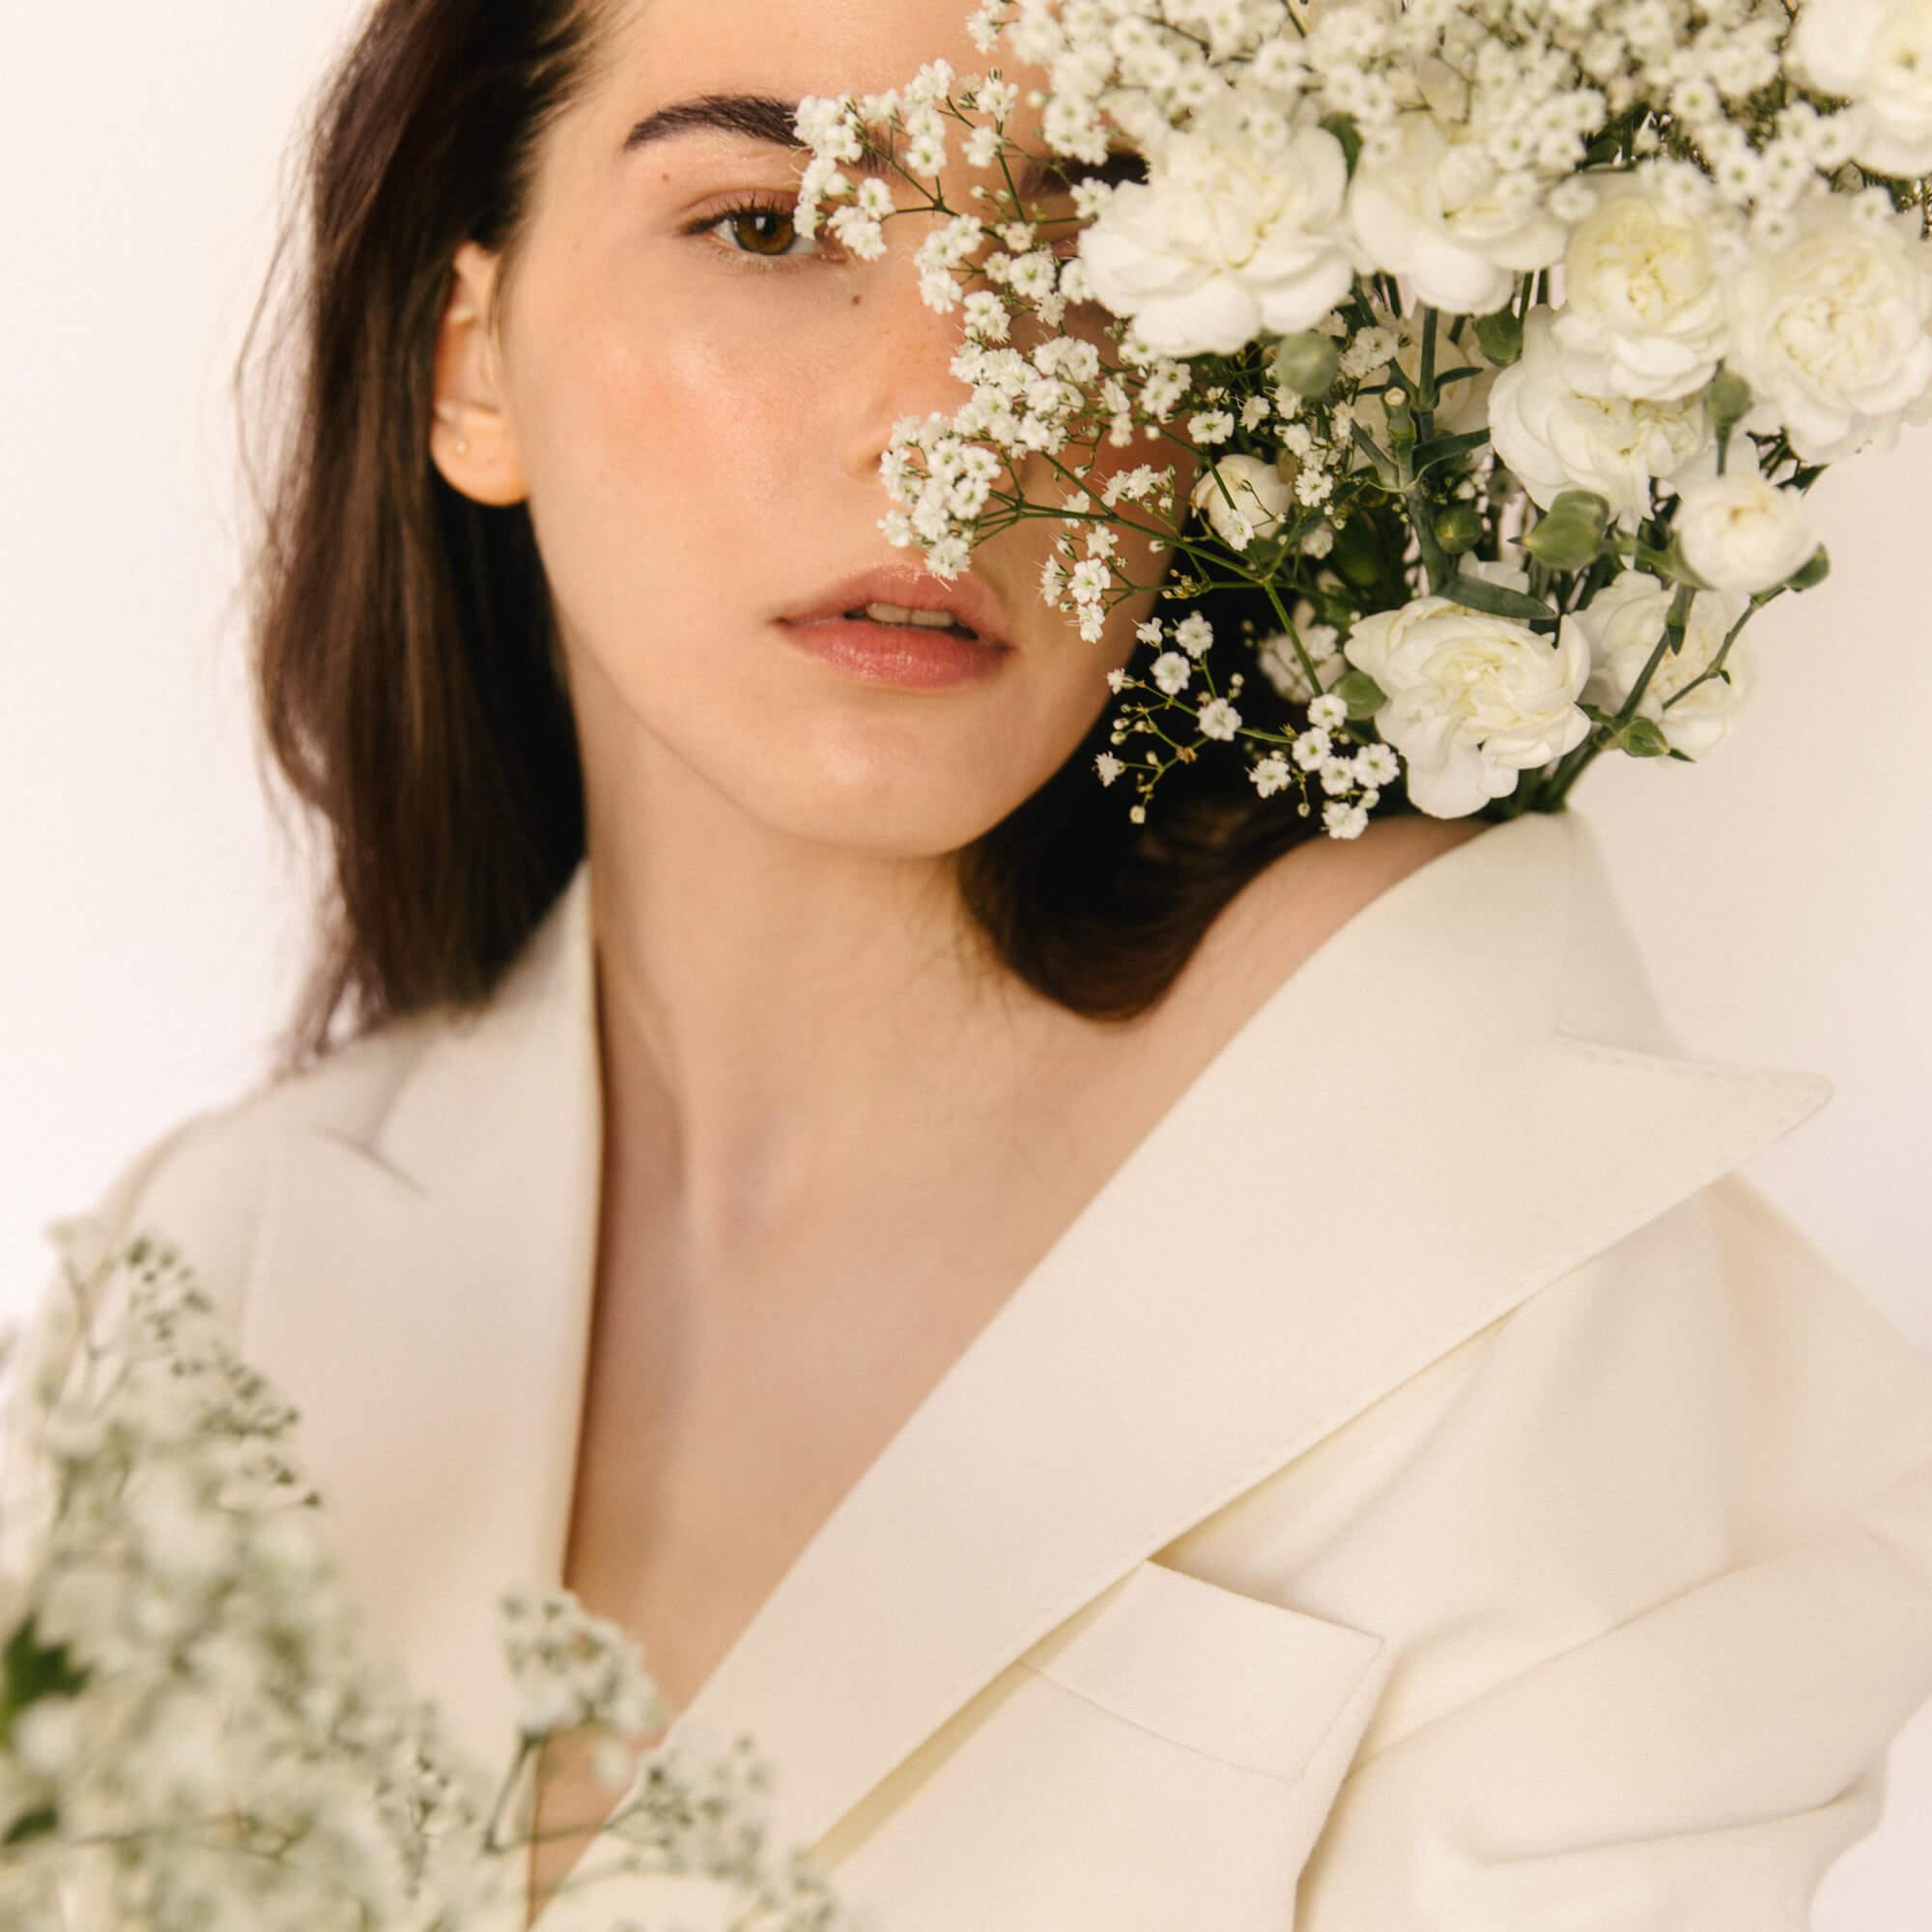 lena-herrmann-magda-butrym-flower-01